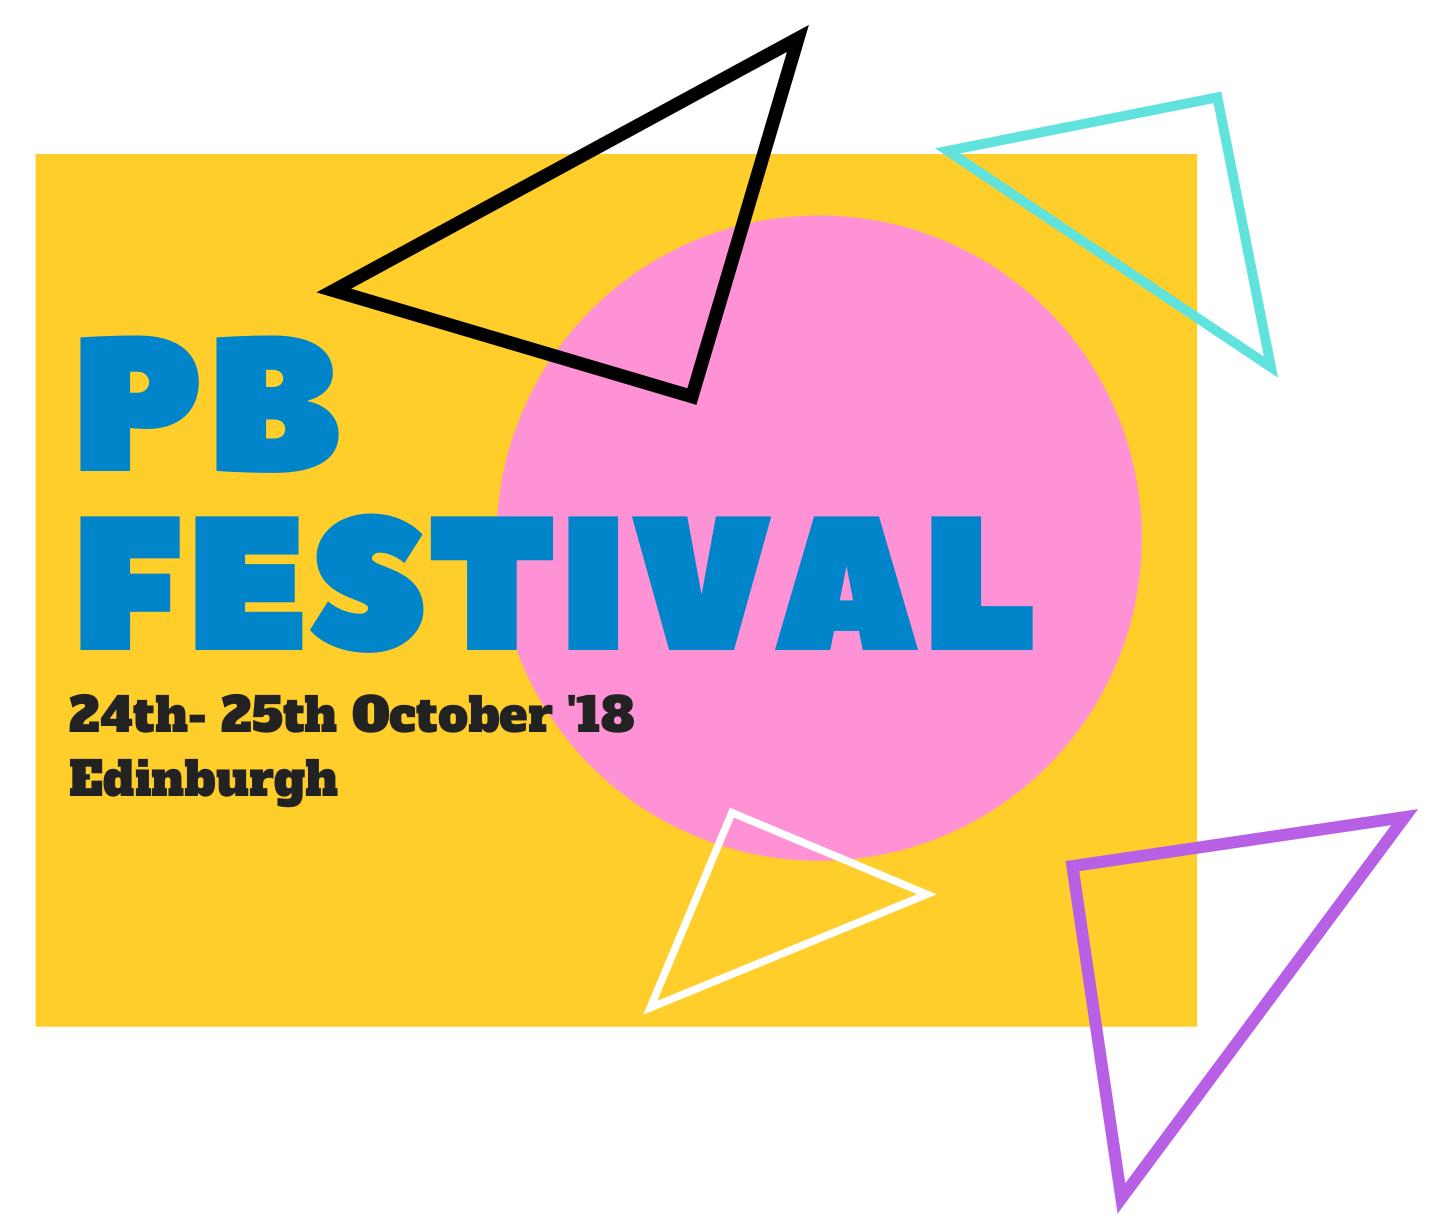 PB Festival Scotland logo